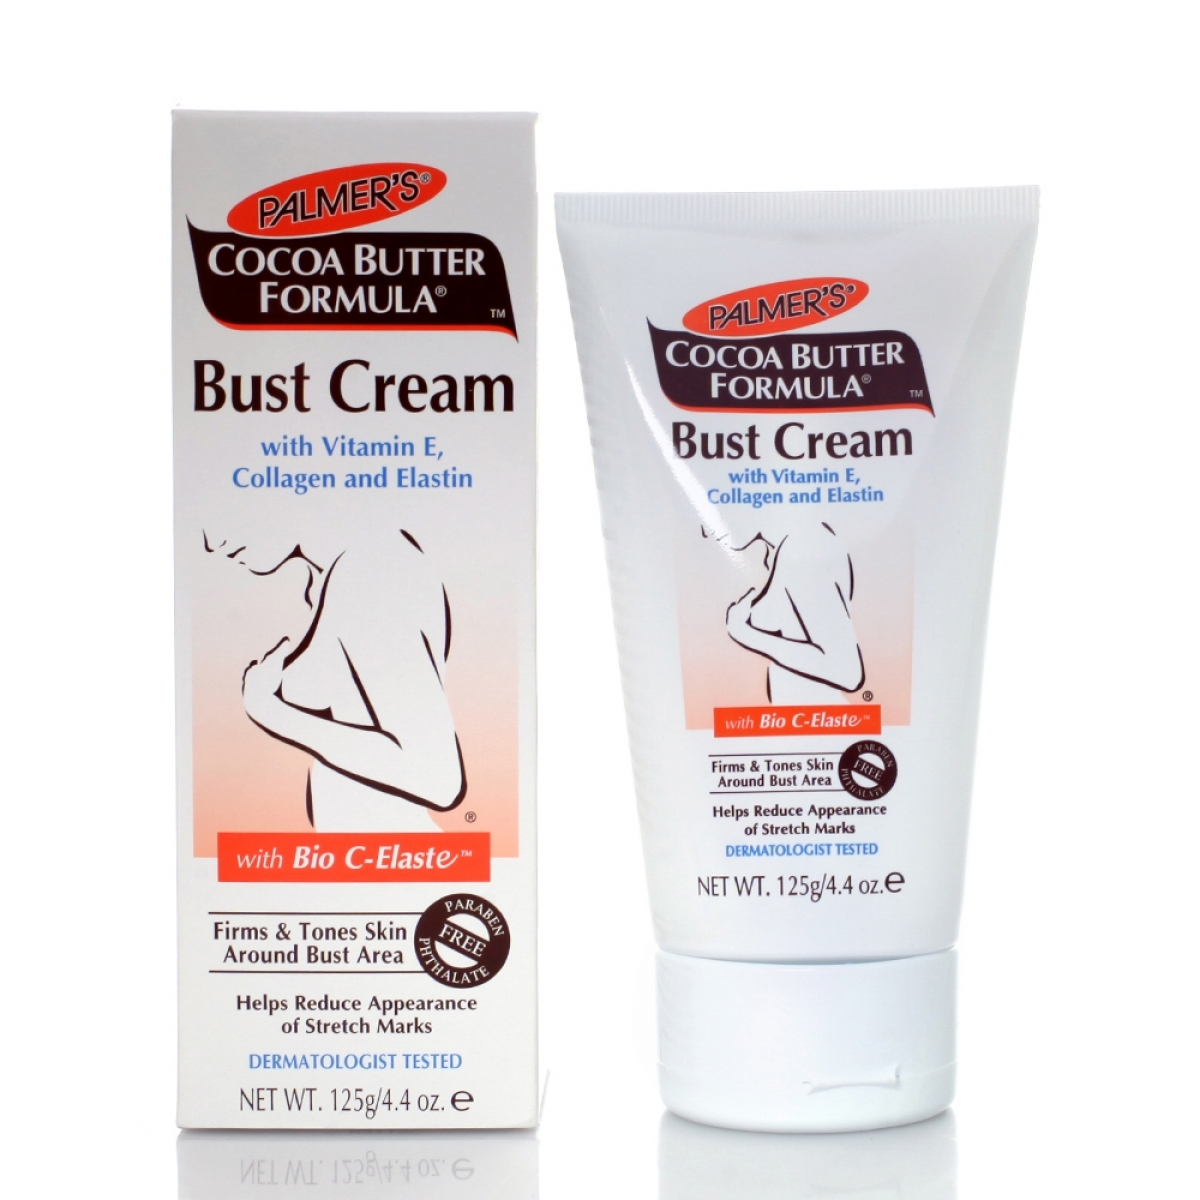 Kem săn chắc da vùng ngực Bust cream 125gr - 1014685 , 7395586457748 , 62_2856629 , 349000 , Kem-san-chac-da-vung-nguc-Bust-cream-125gr-62_2856629 , tiki.vn , Kem săn chắc da vùng ngực Bust cream 125gr